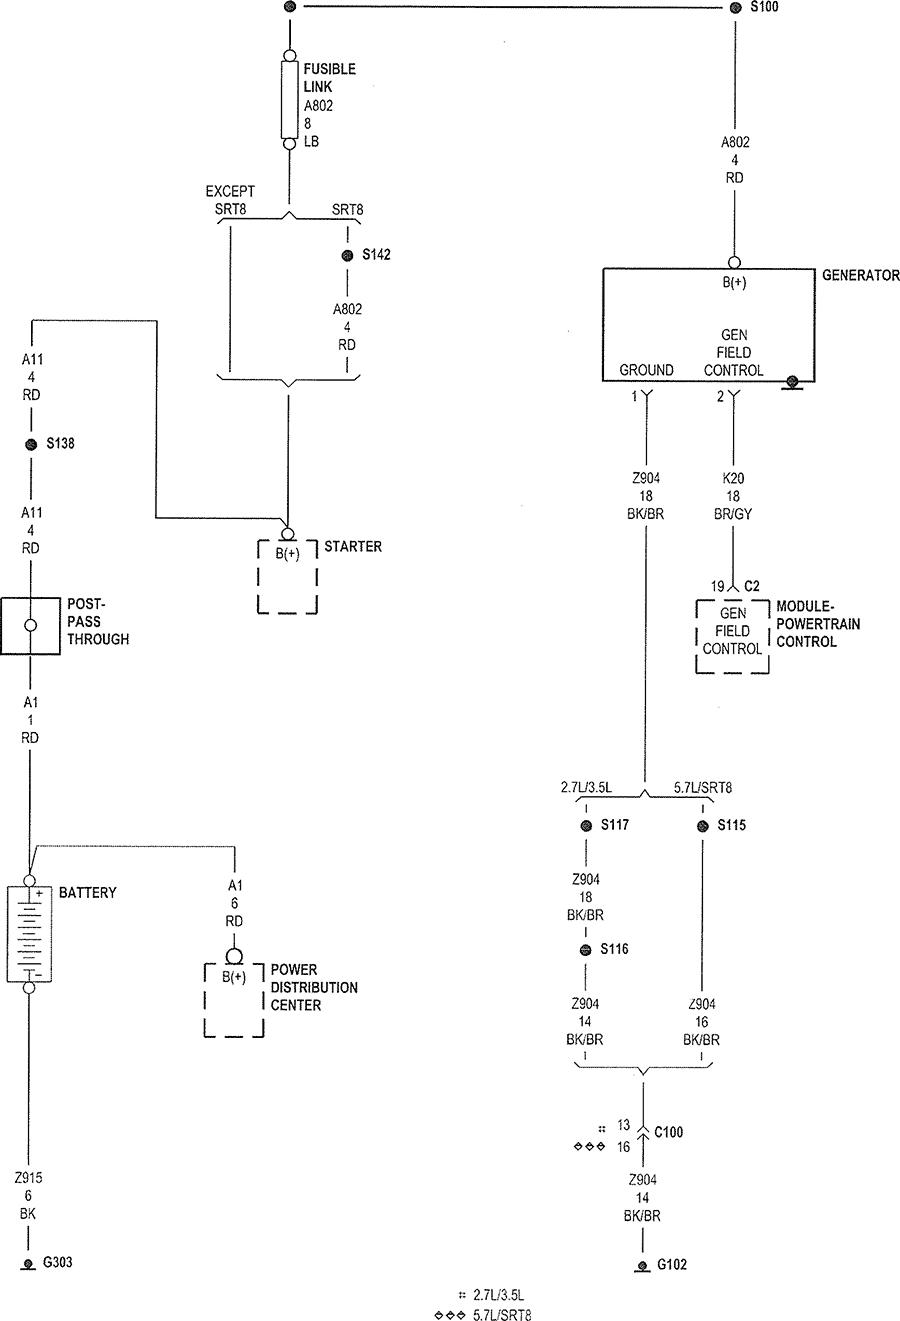 318feb08-76a2-4b5e-9eea-2ebe18c4ac40_charging system circuit.png